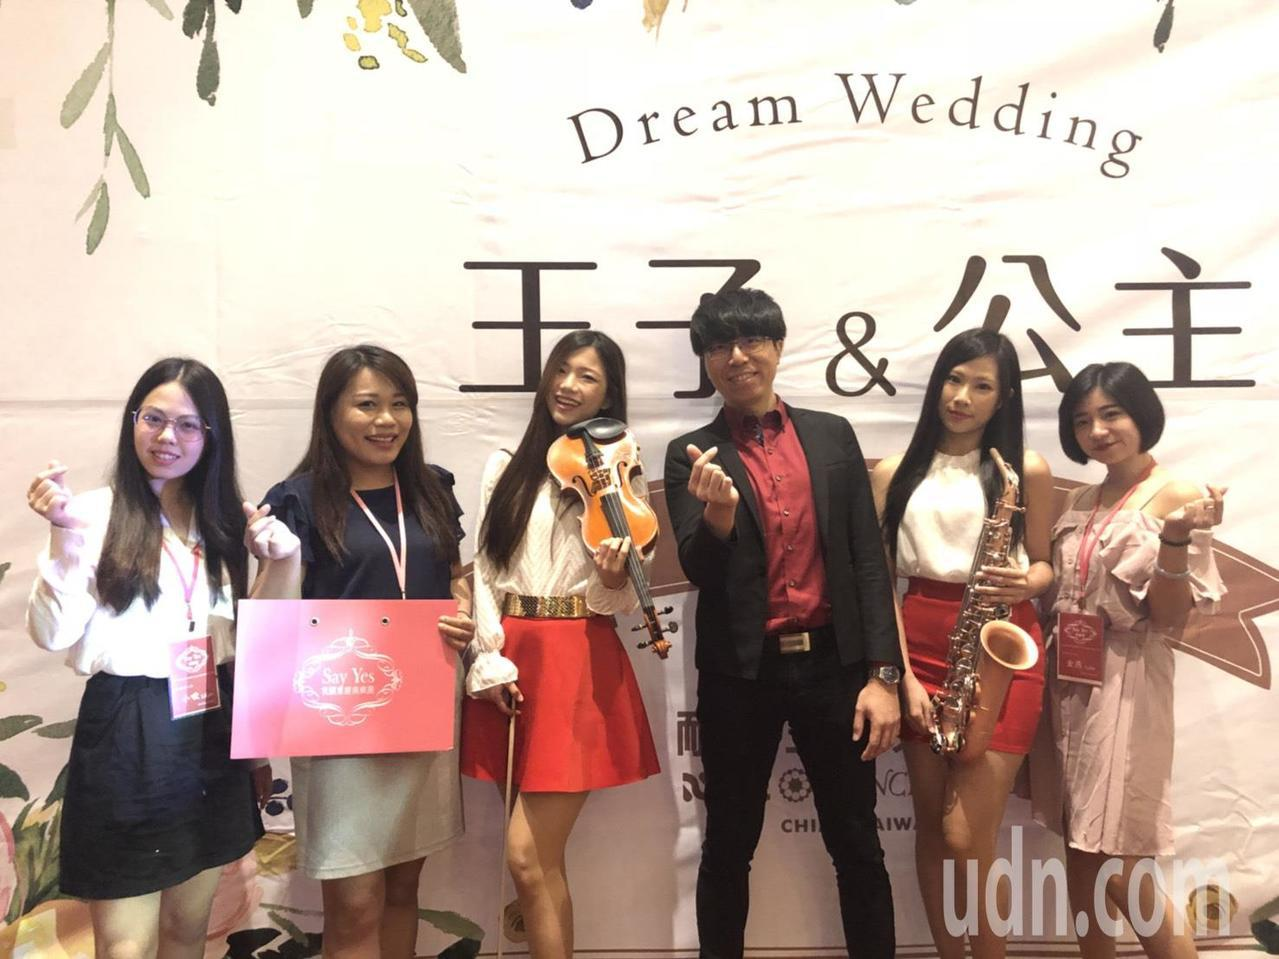 「Say yes我願意樂團」總監賴延鑫(右三)說,時下浪漫婚禮少不了樂團演奏,許...